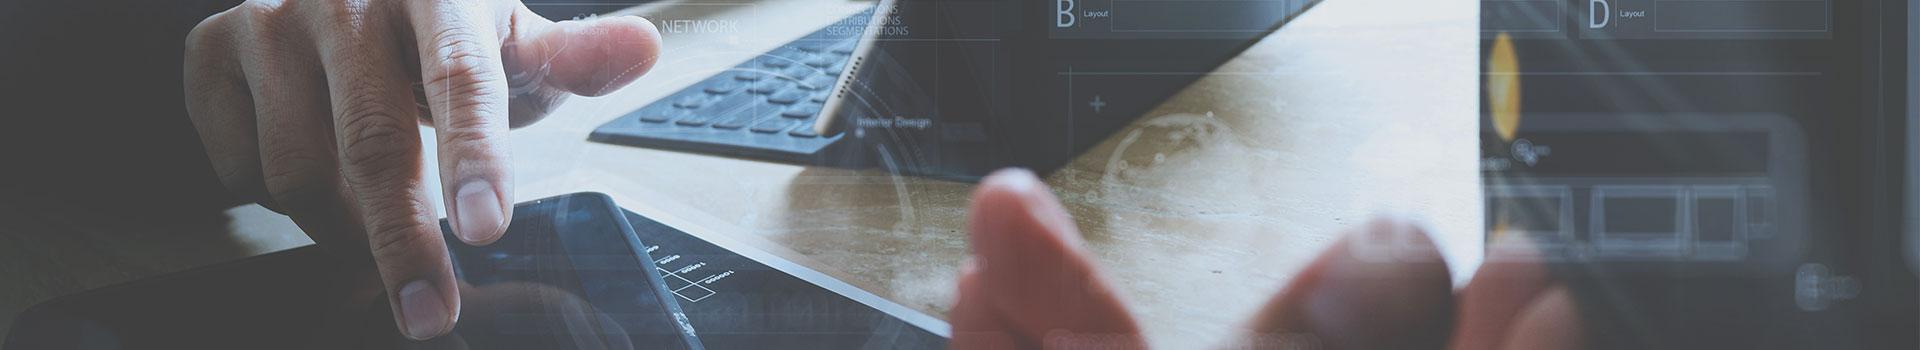 Web-Entwicklung, App, Screendesign, Funktionen